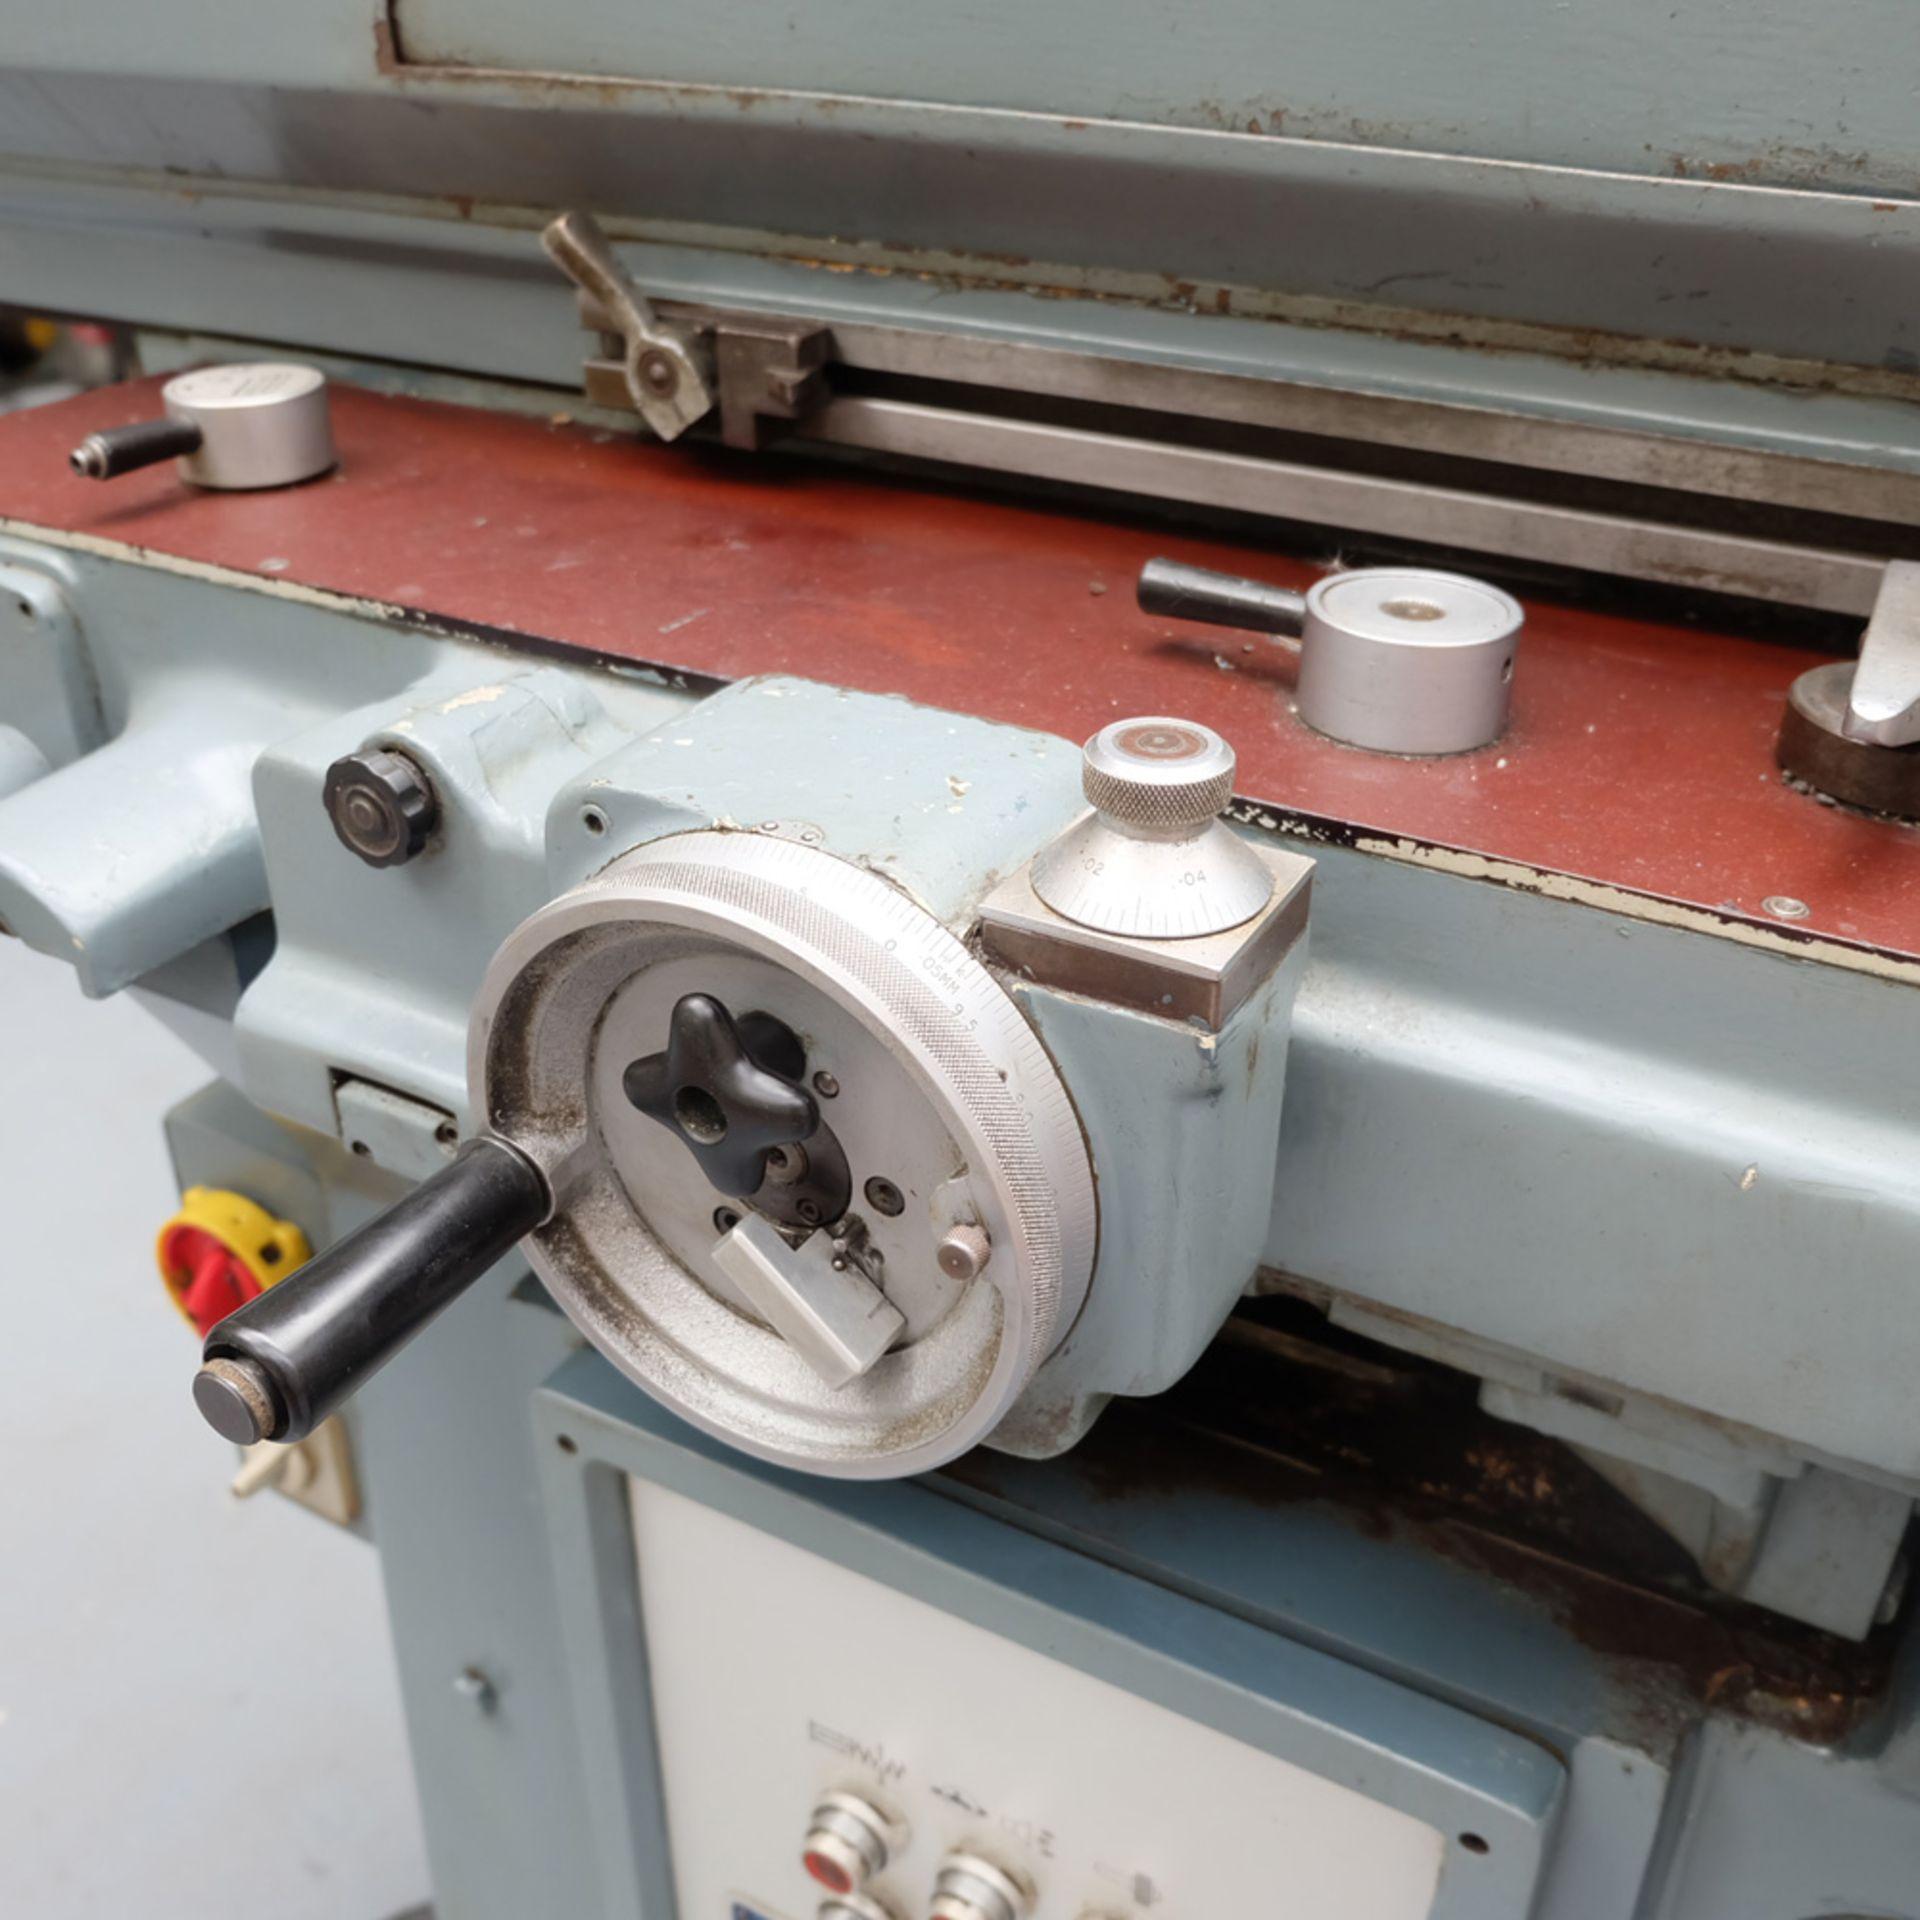 Jones & Shipman 1400P Toolroom Surface Grinder. - Image 4 of 10